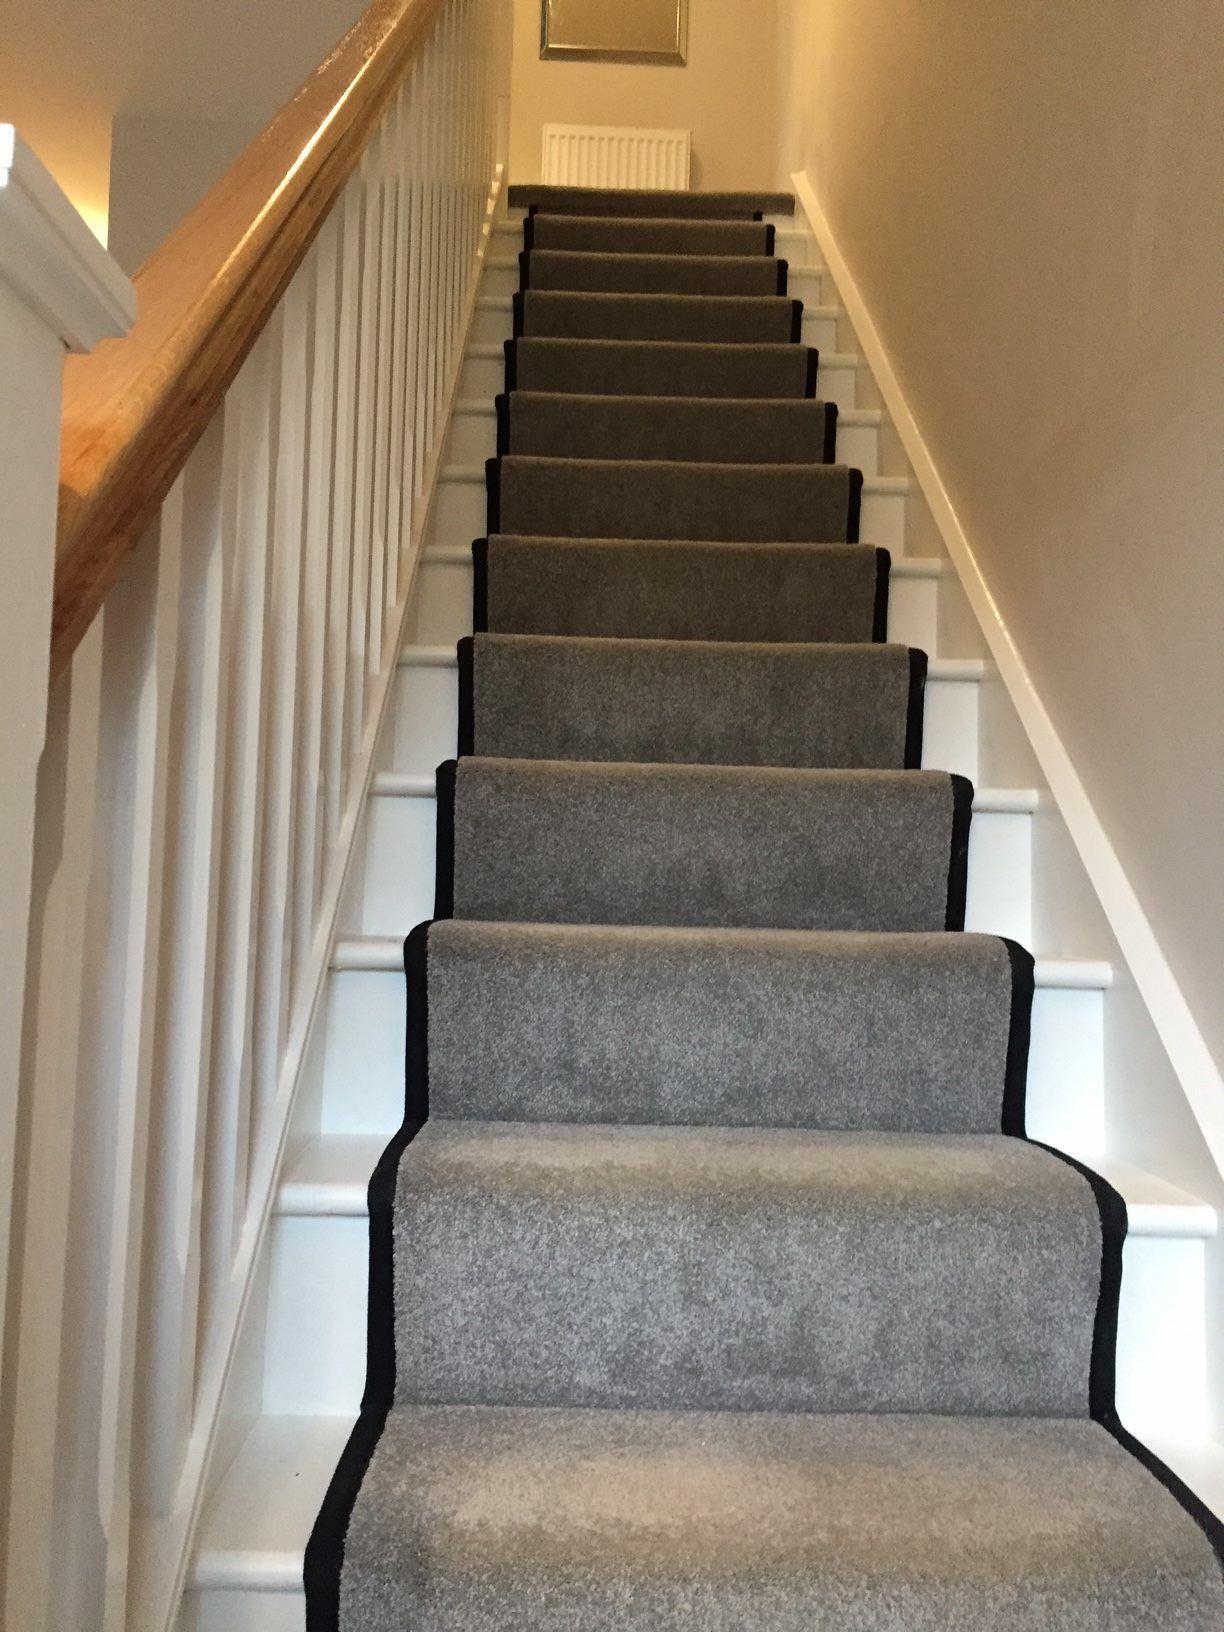 Stair carpet | Stairs, Home decor